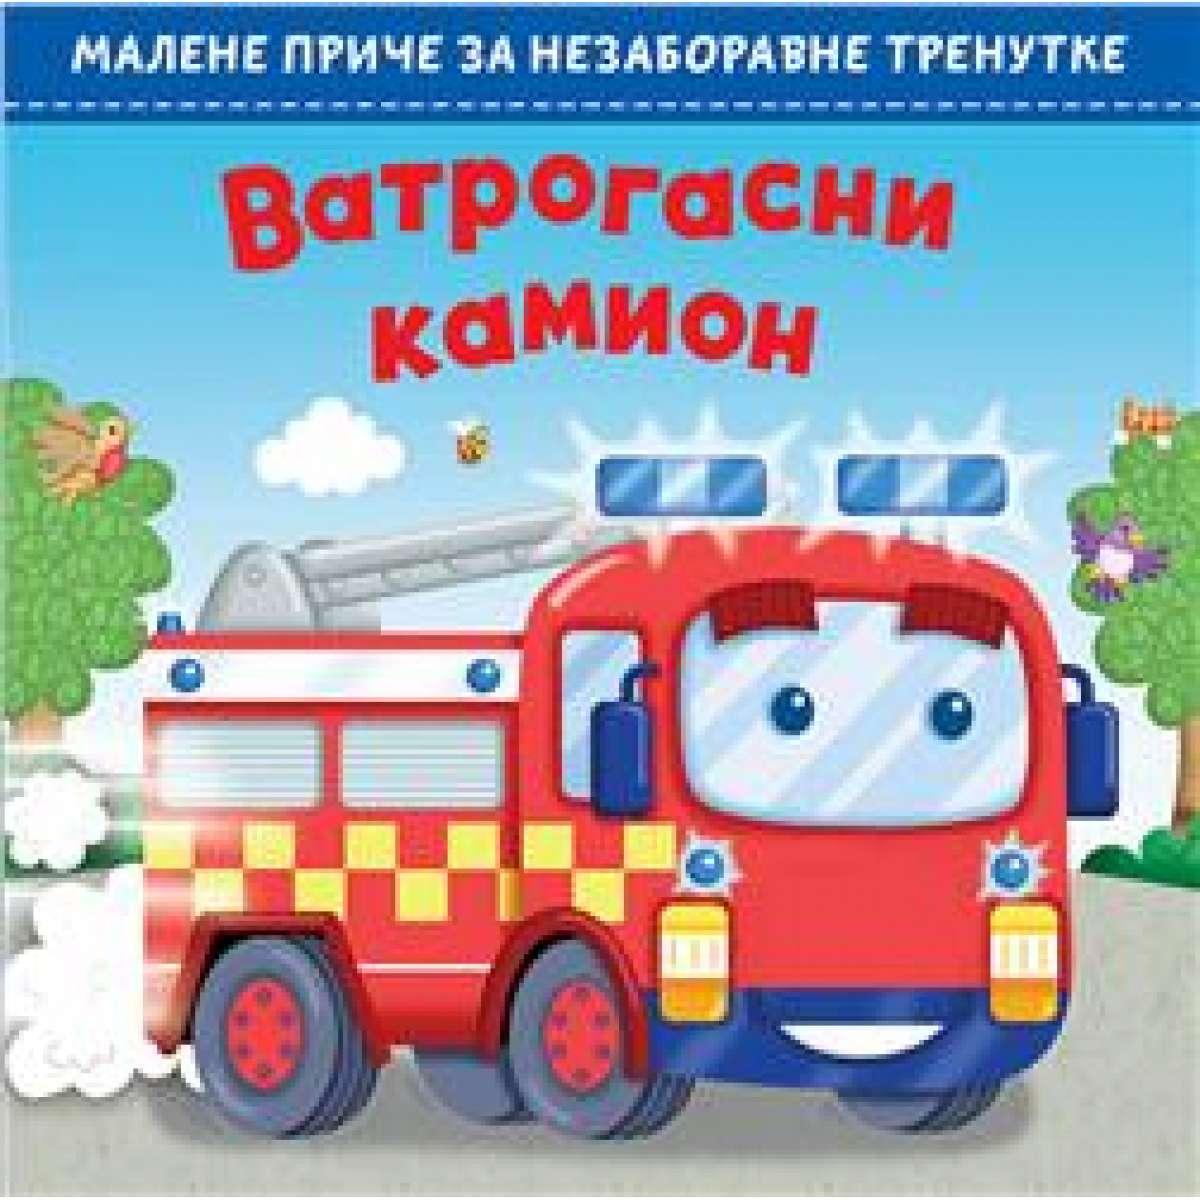 Malene priče za nezaboravne trenutke: Vatrogasni kamion